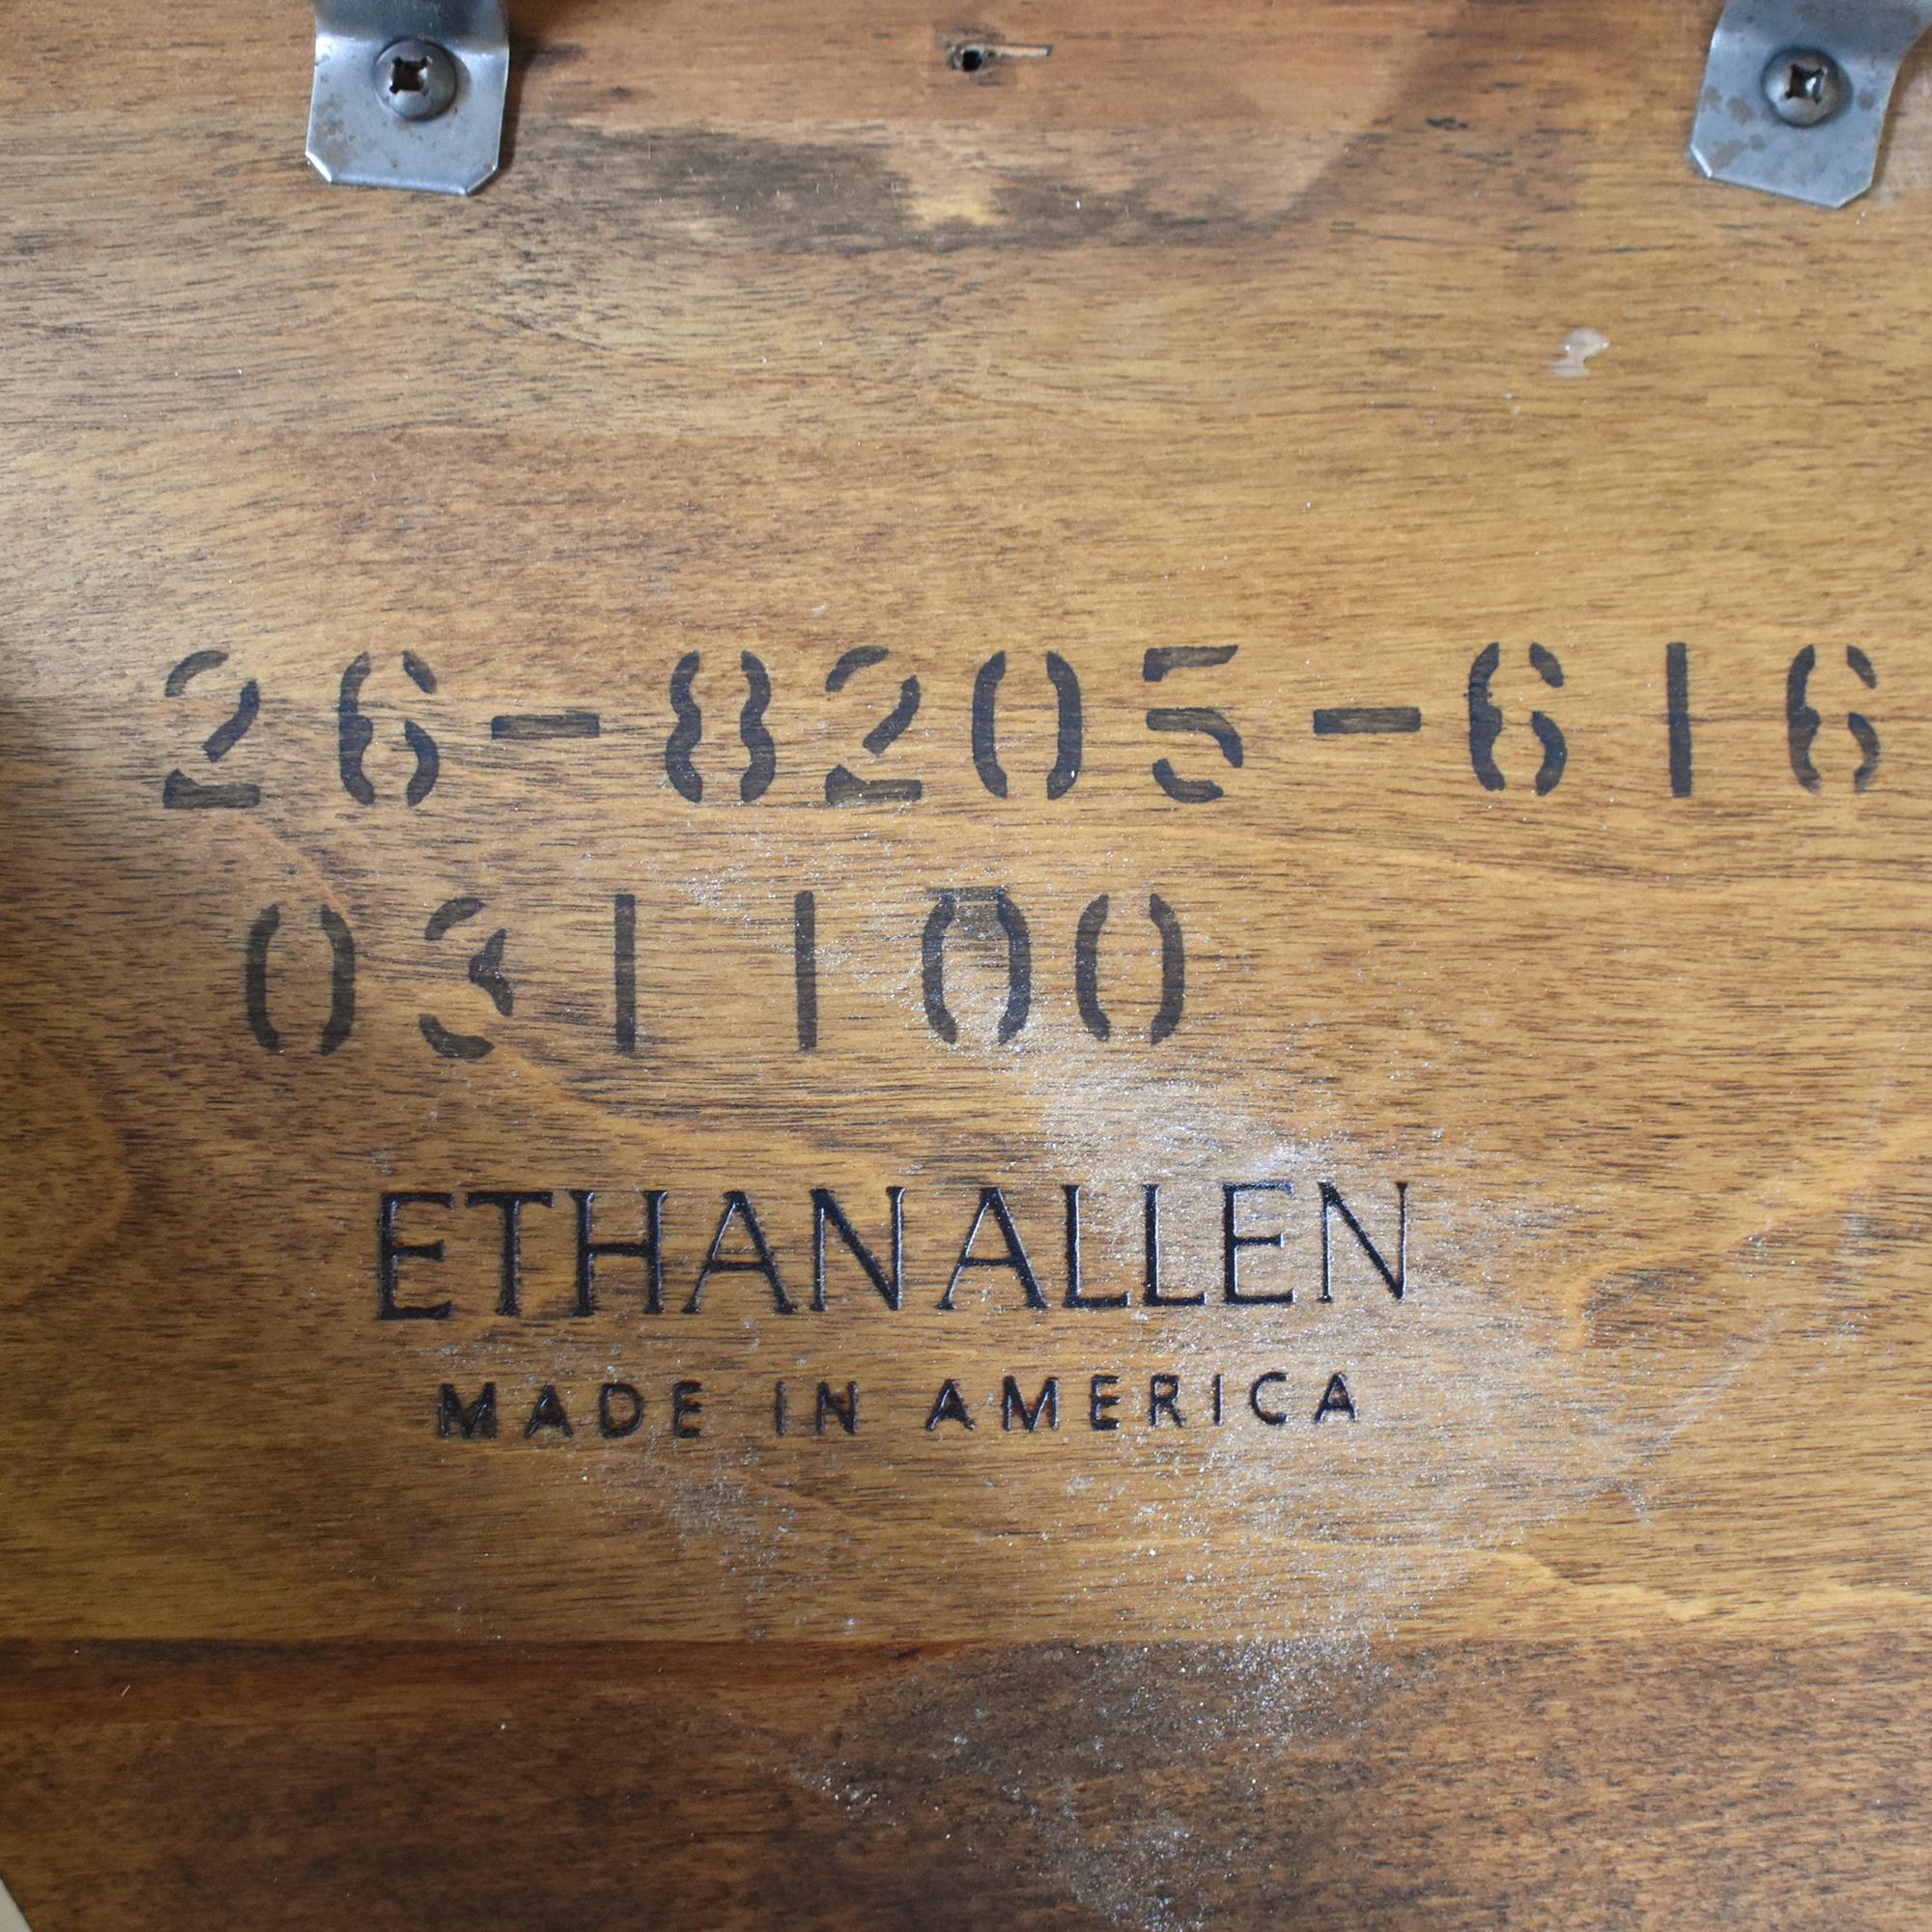 Ethan Allen Ethan Allen Occasional Table coupon